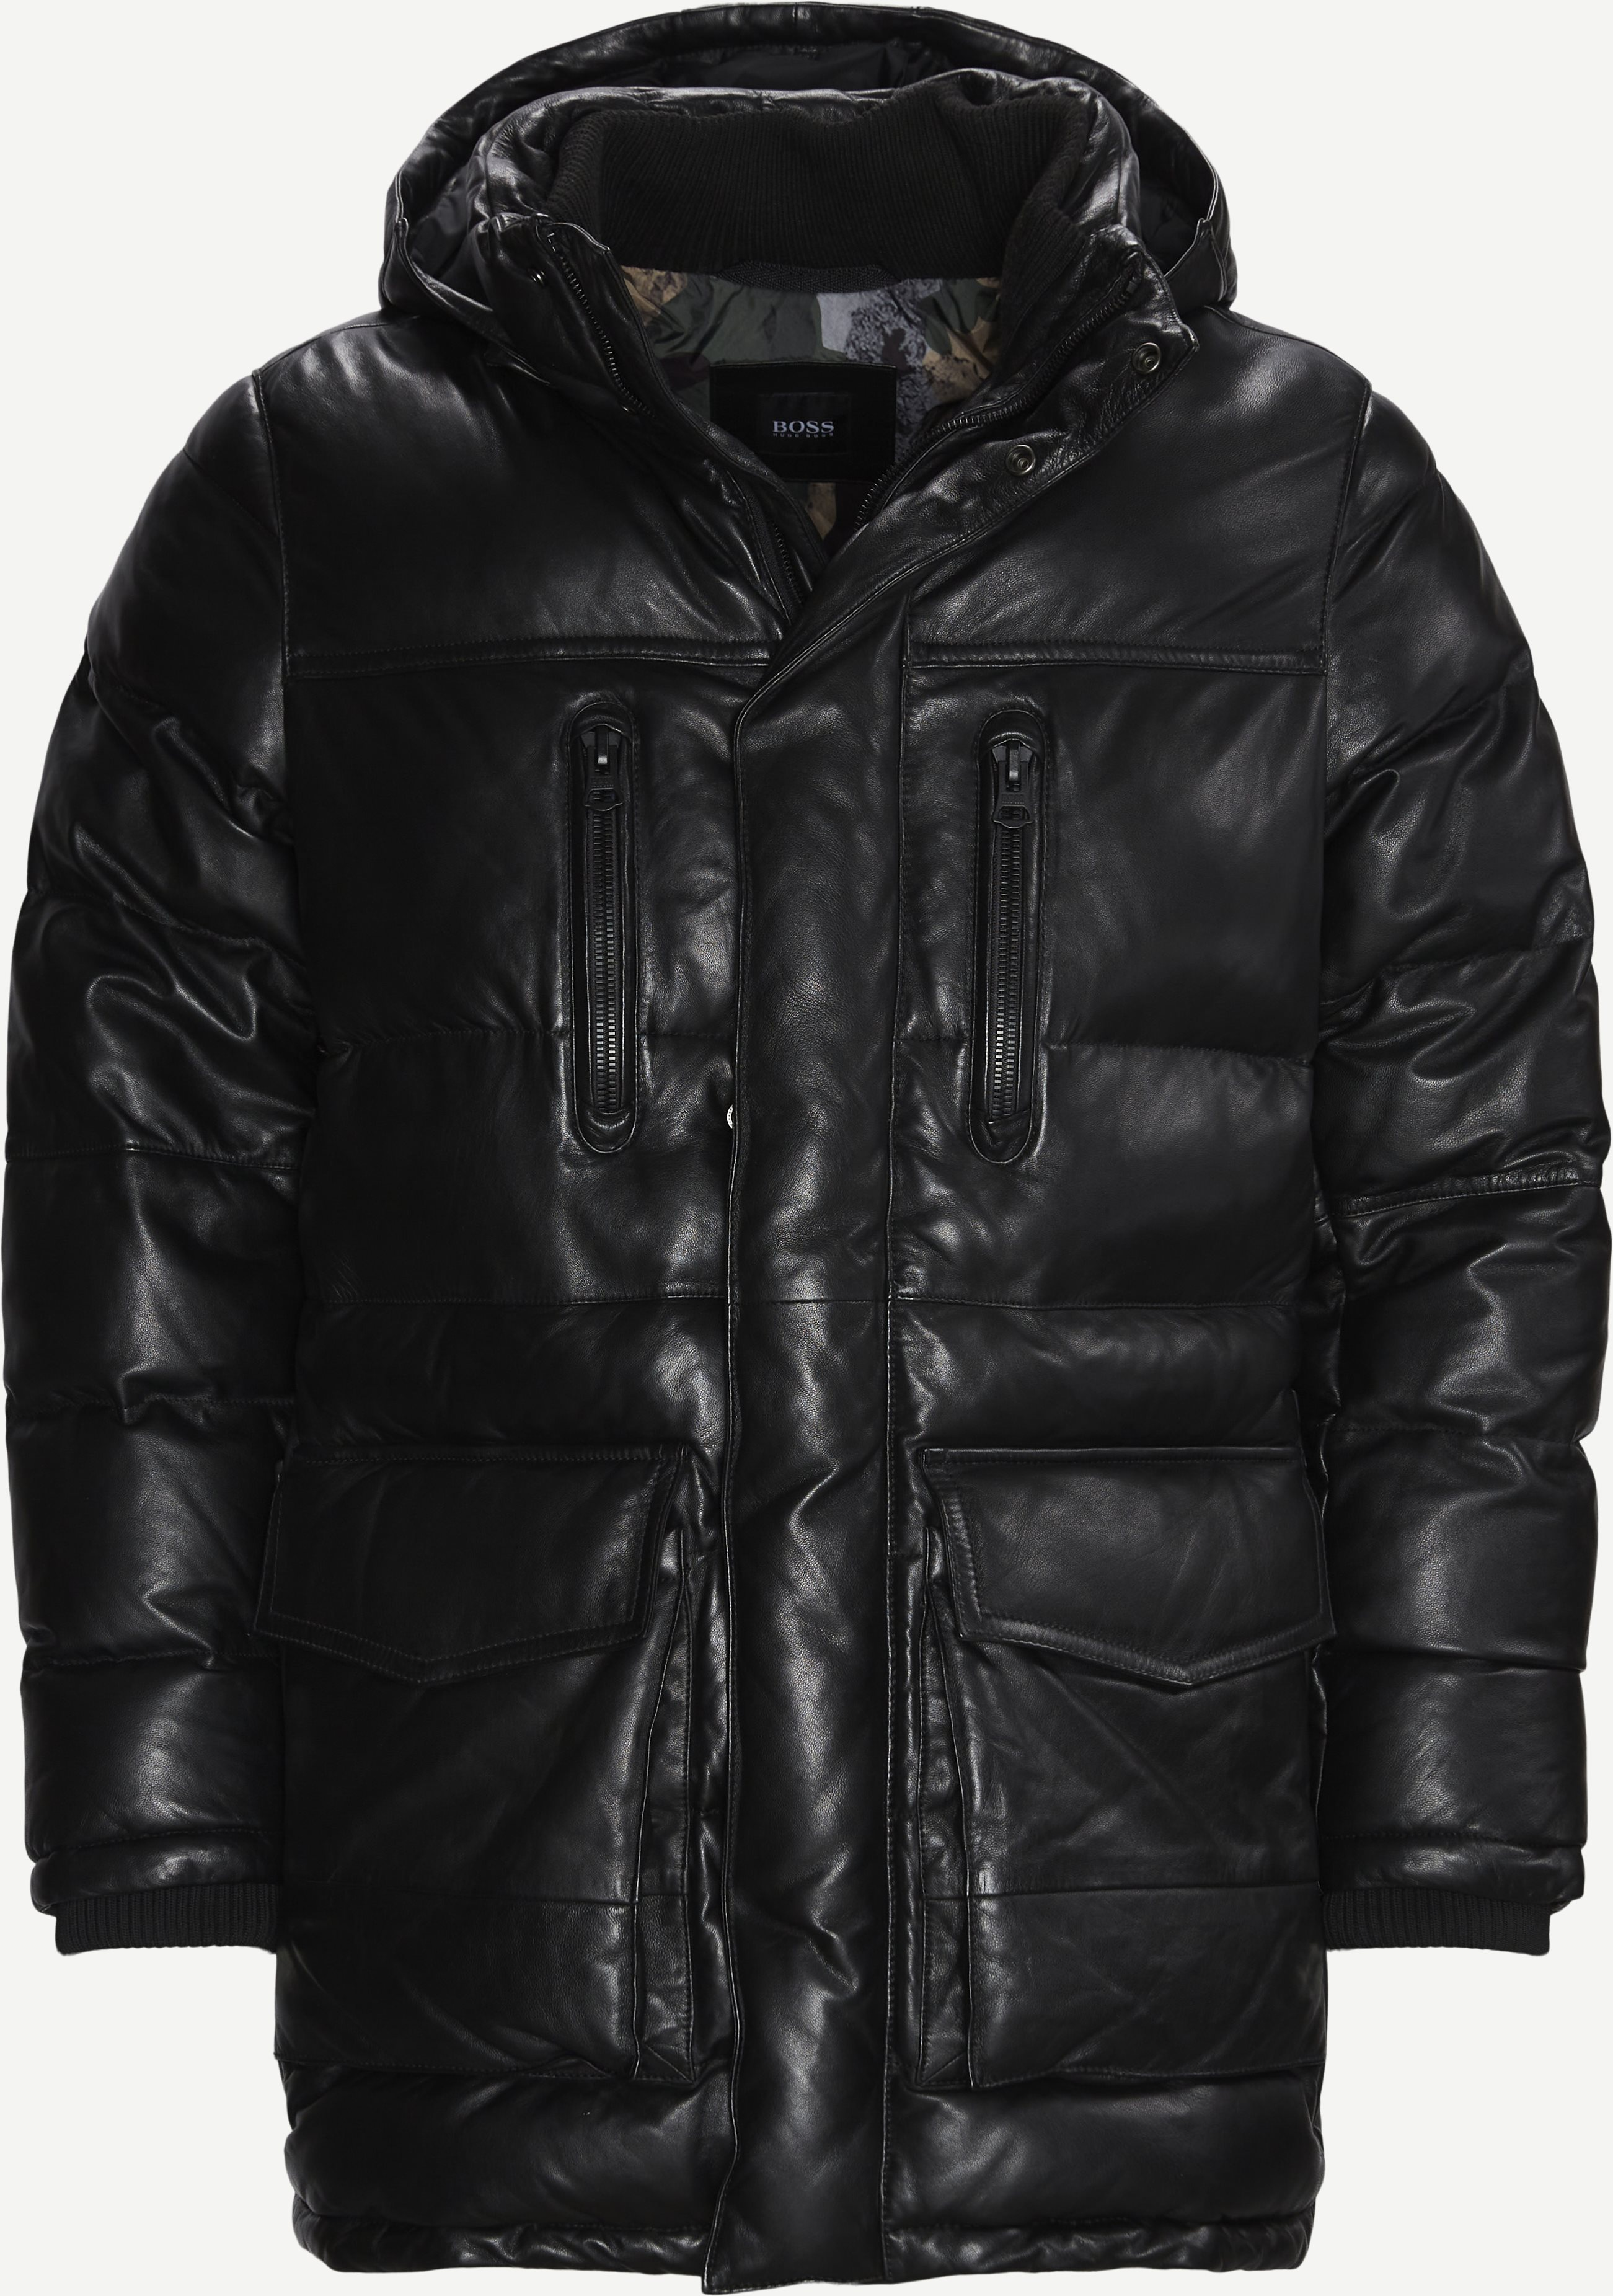 Jacker Leather Jacket - Jackets - Regular fit - Black